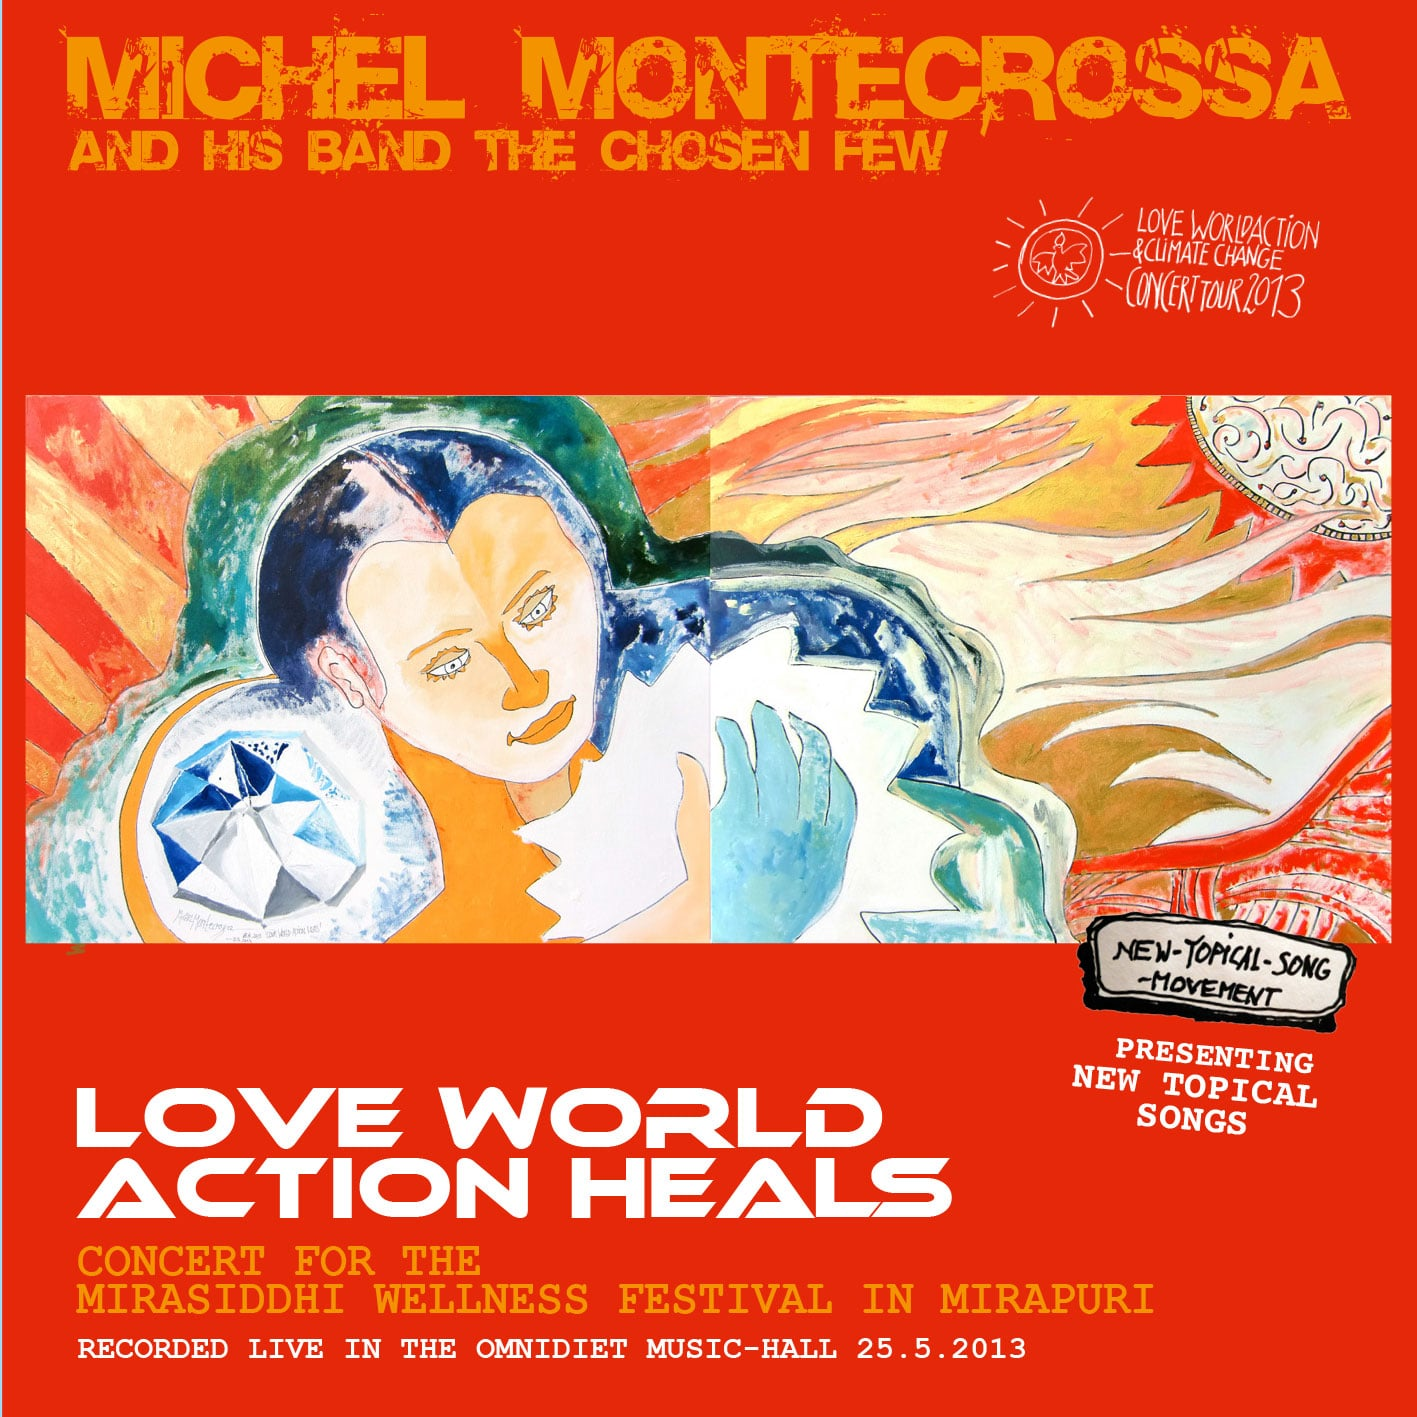 Love World Action Heals Concert